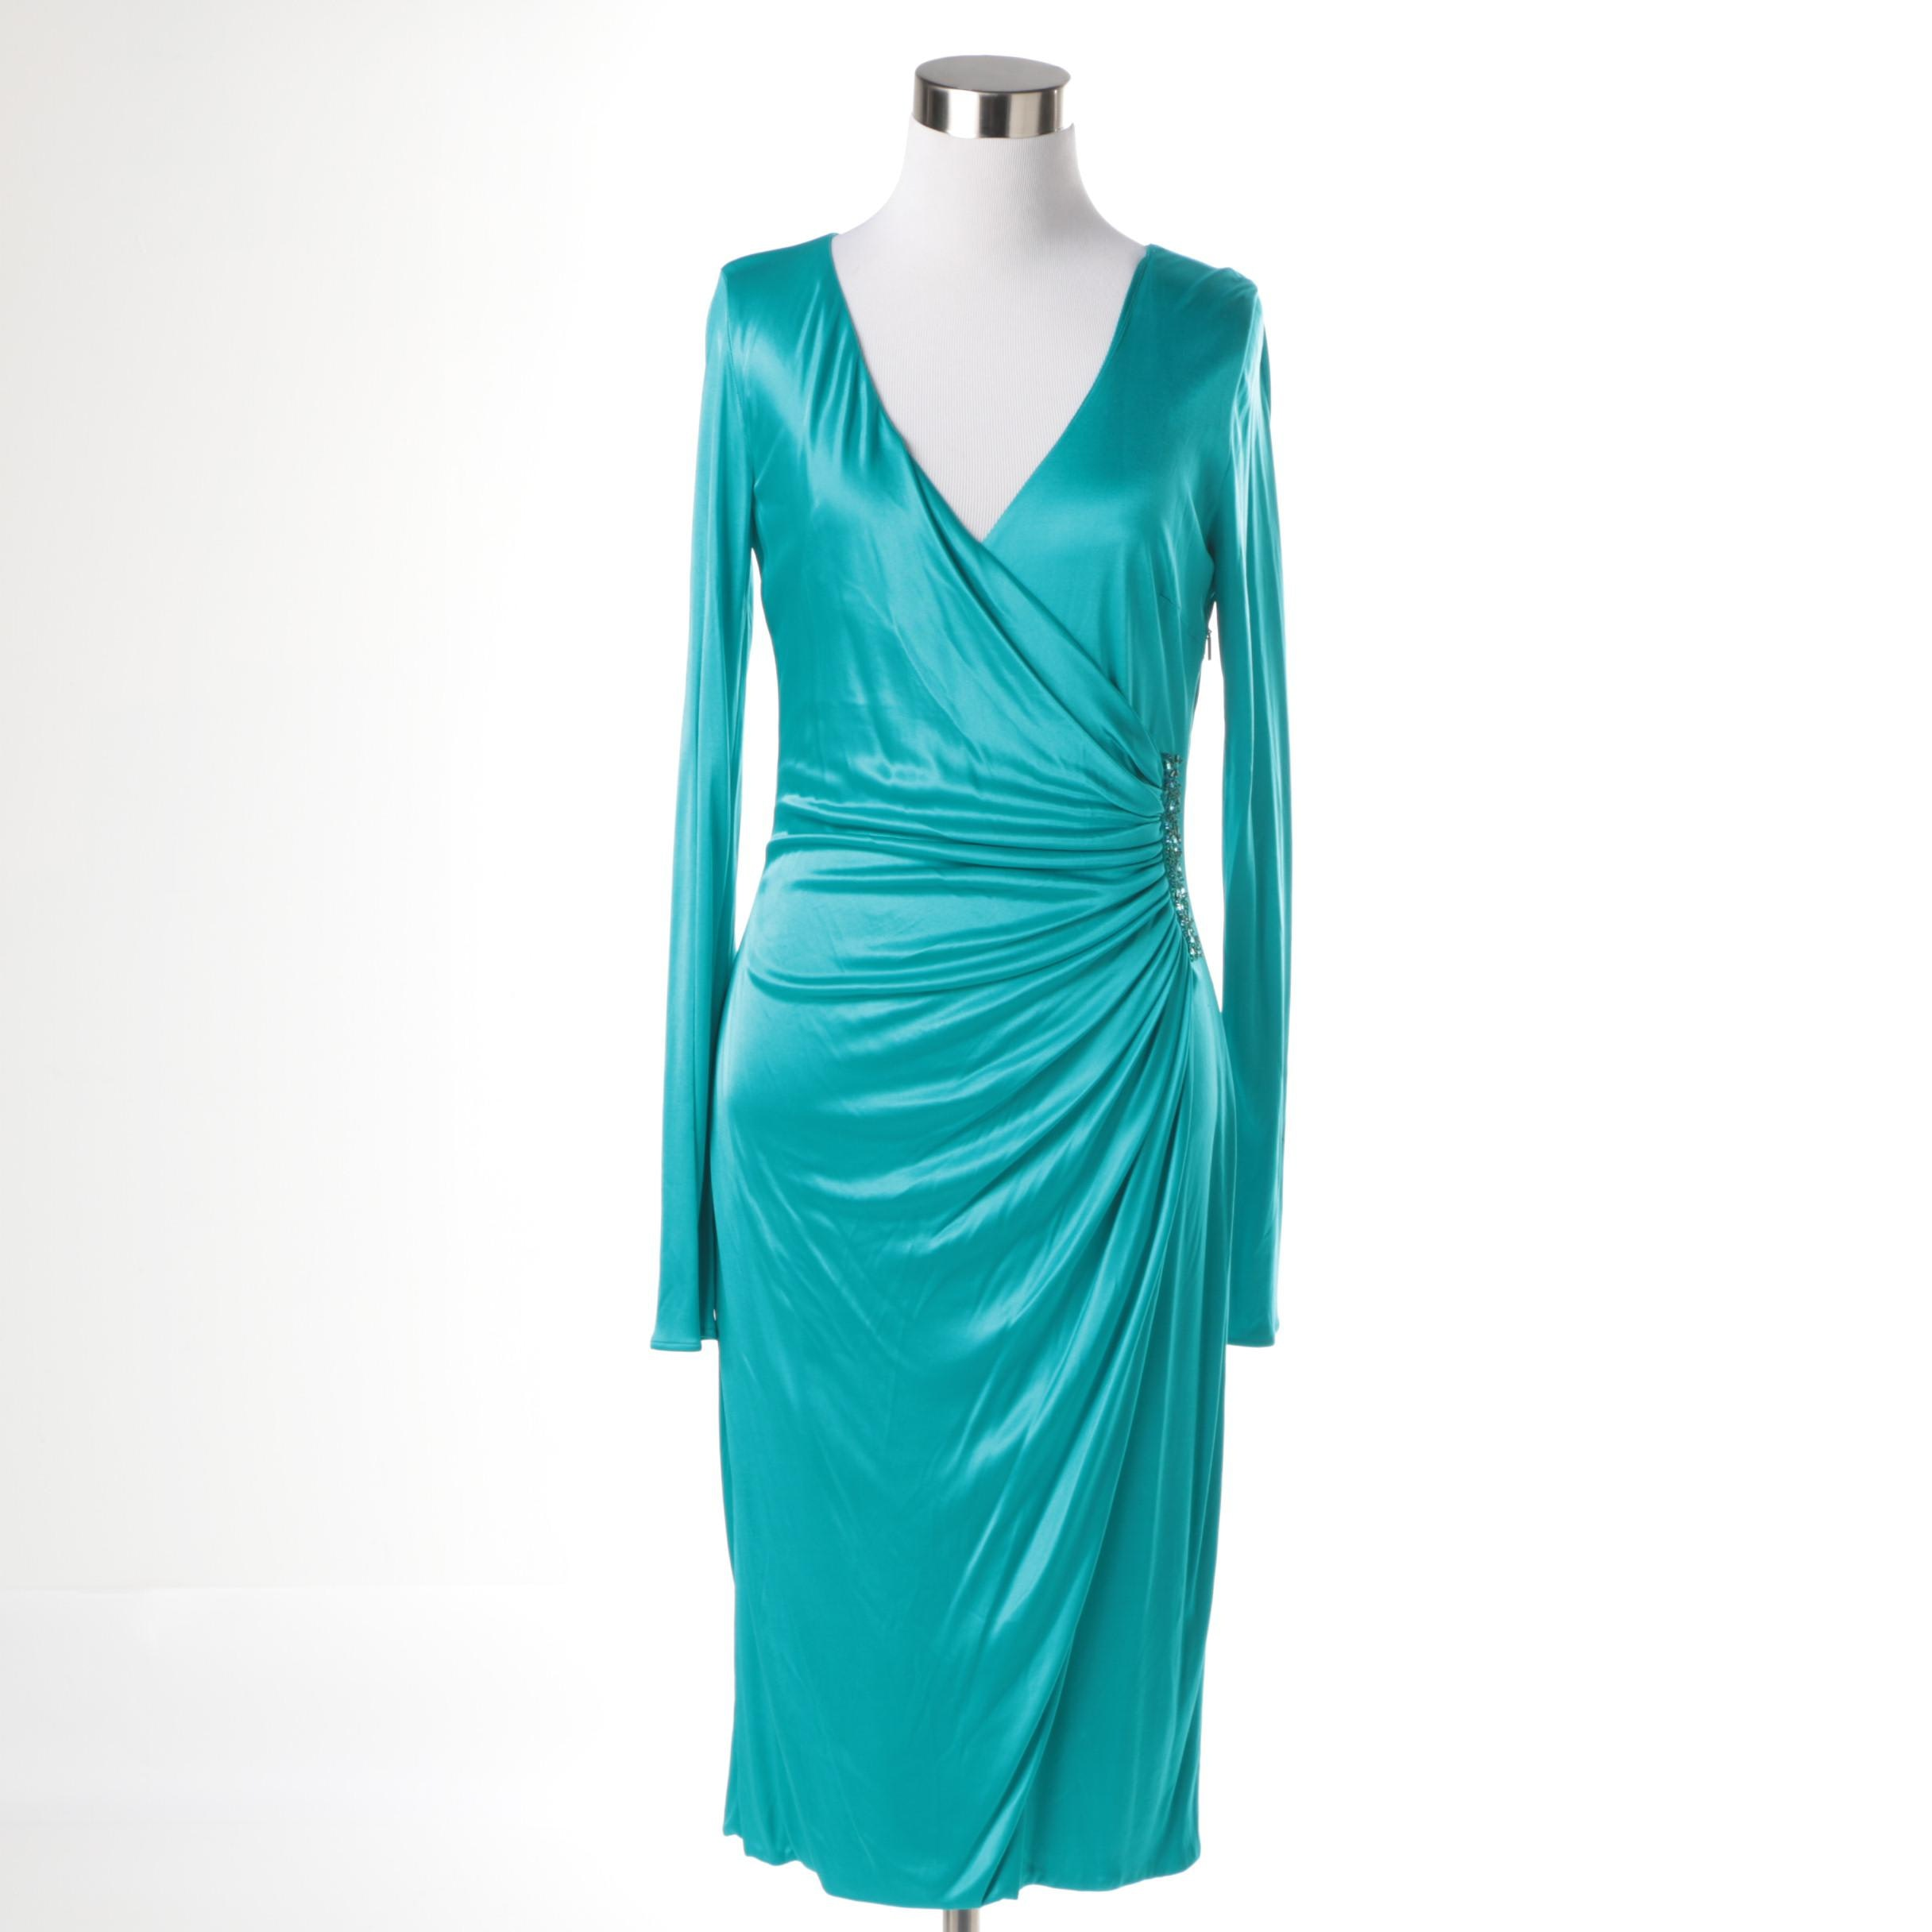 Versace Abito Donna-Ricamo Cocktail Dress